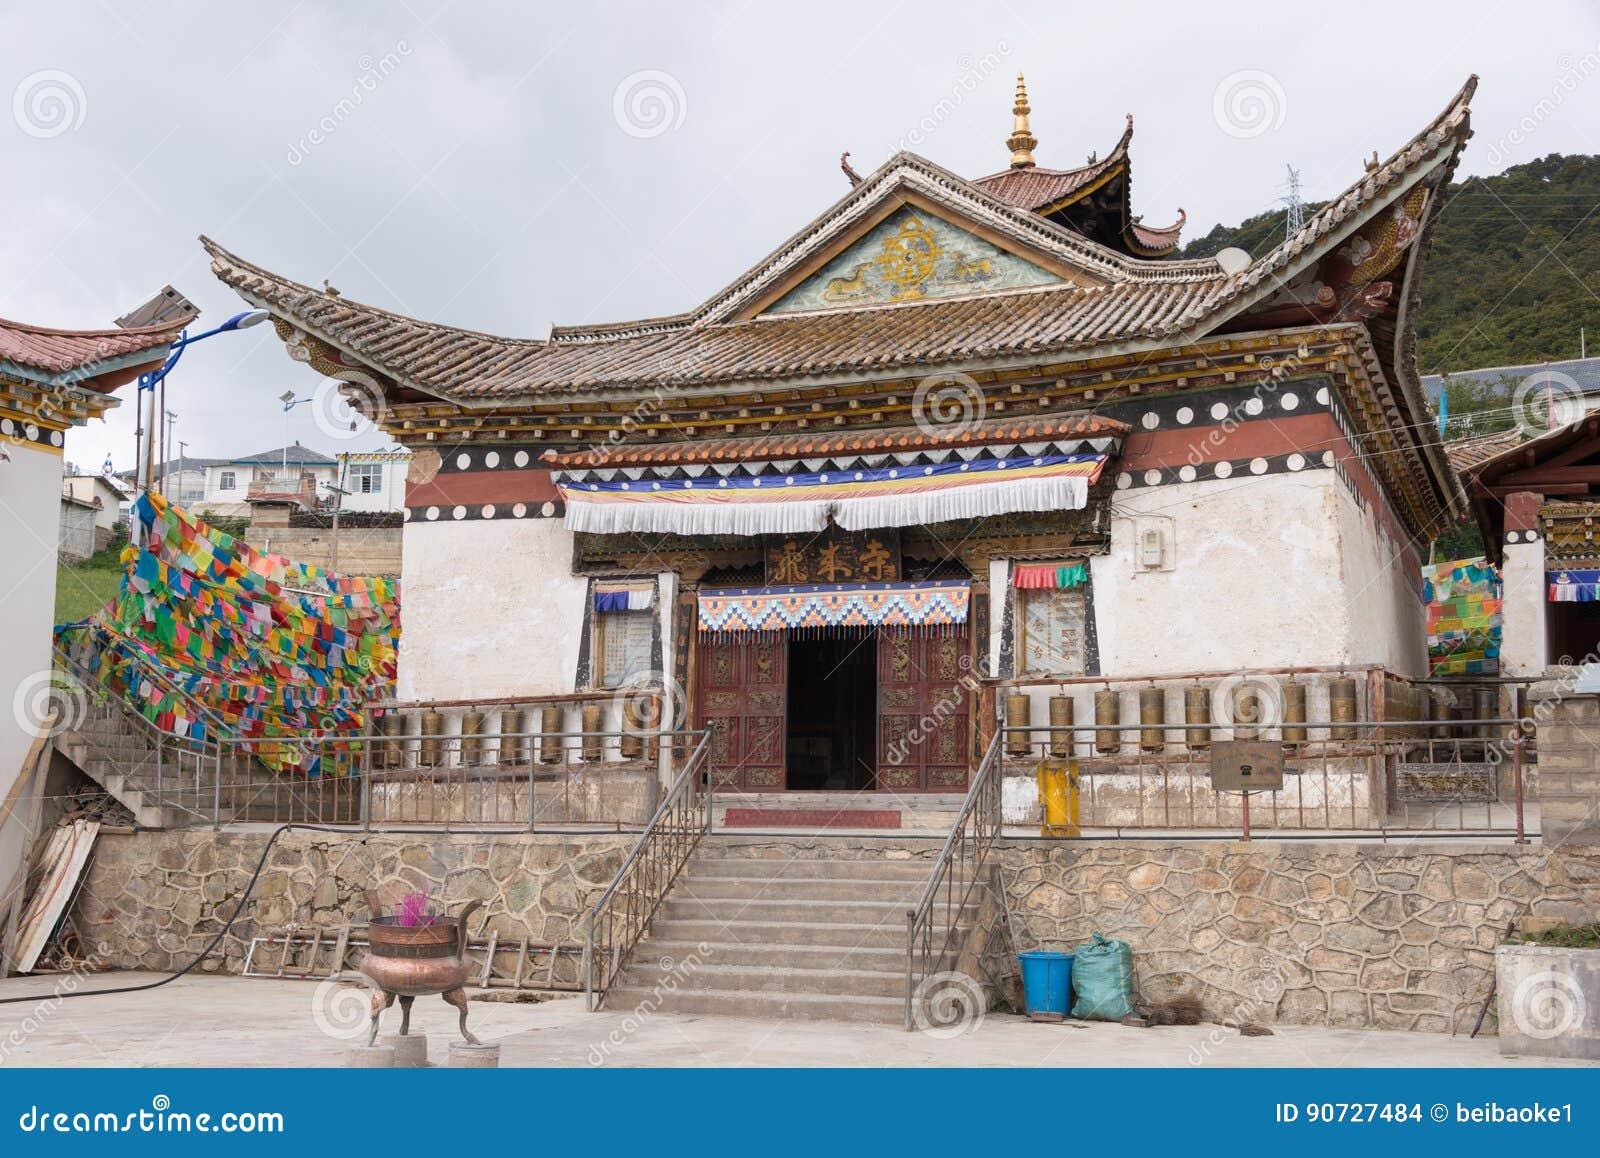 DEQIN, CINA - 3 agosto 2014: Tempio di Feilai un monastero famoso dentro